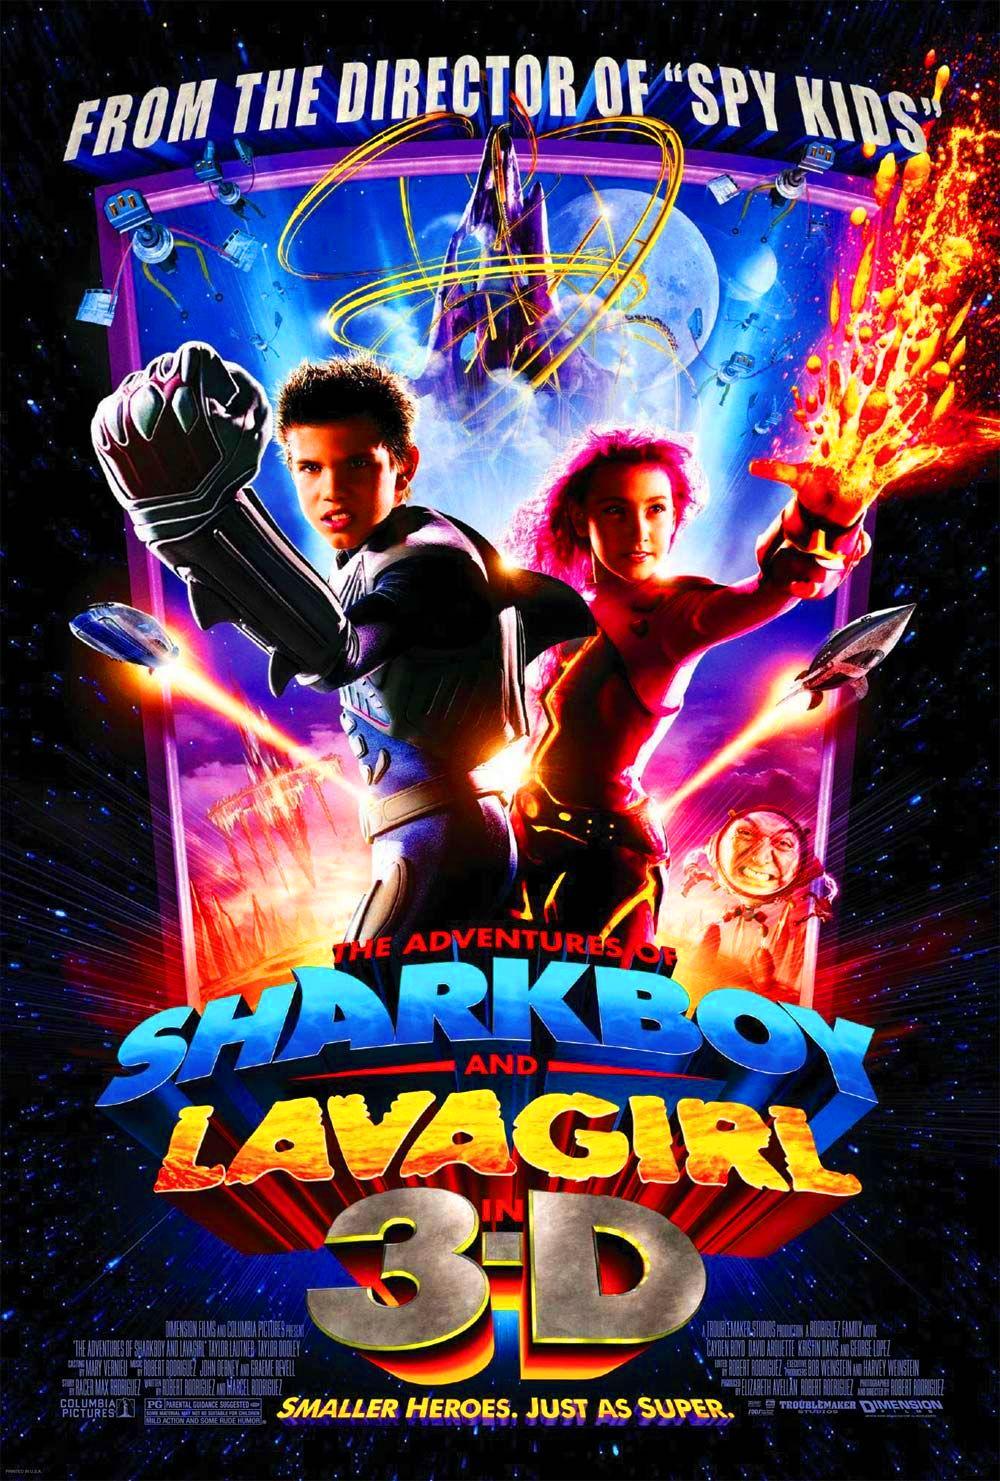 File:Adventures of shark boy and lava girl poster.jpg